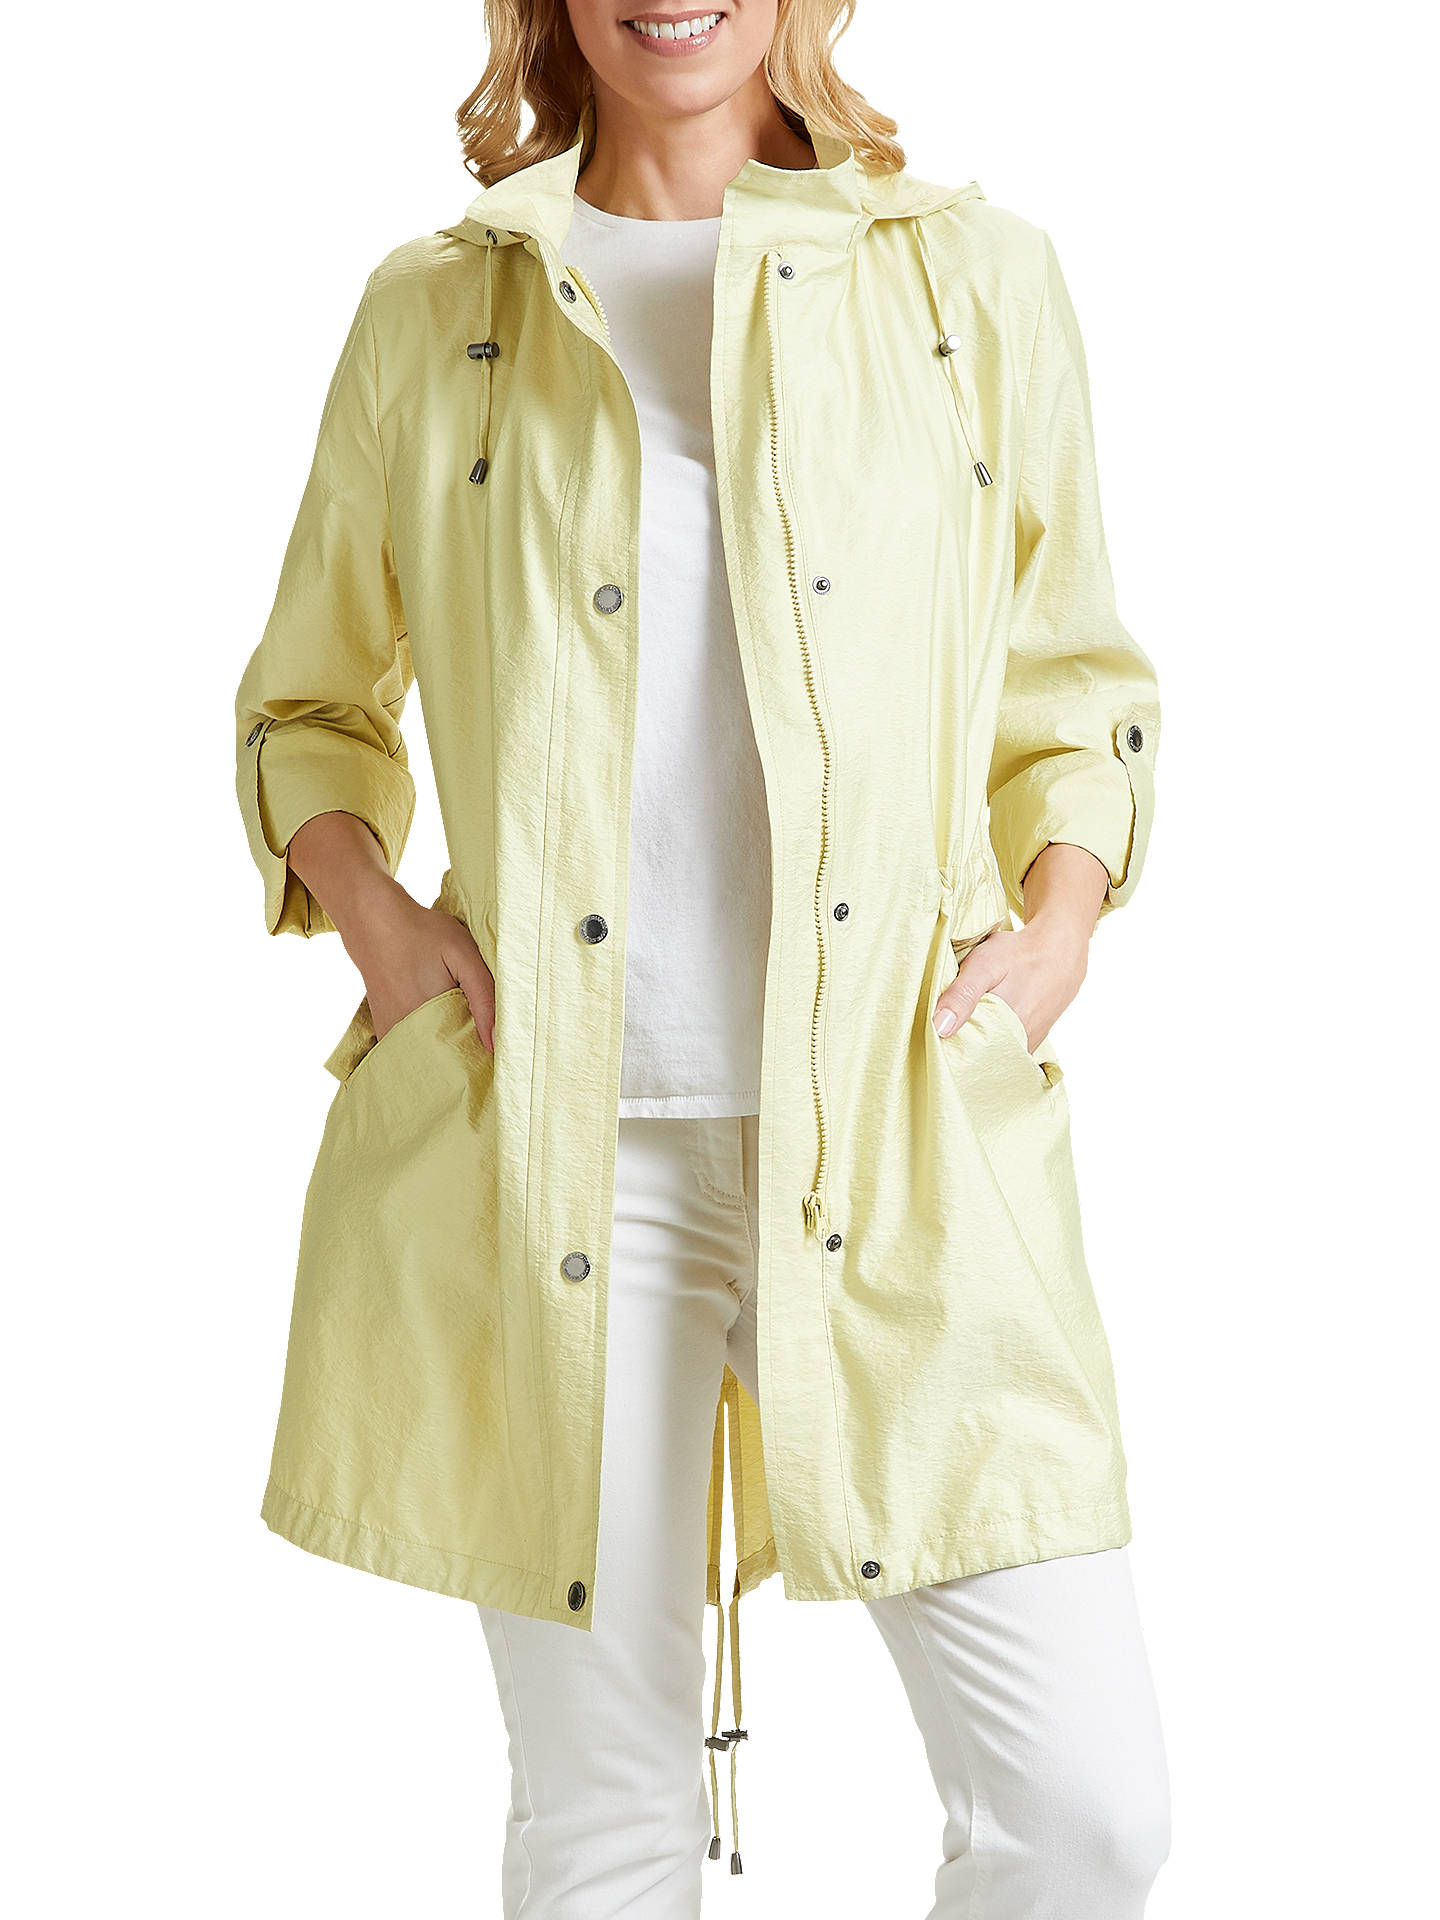 ffaae1d89a9 Buy Four Seasons Lightweight Hooded Parka Coat, Citrus, XS Online at  johnlewis.com ...